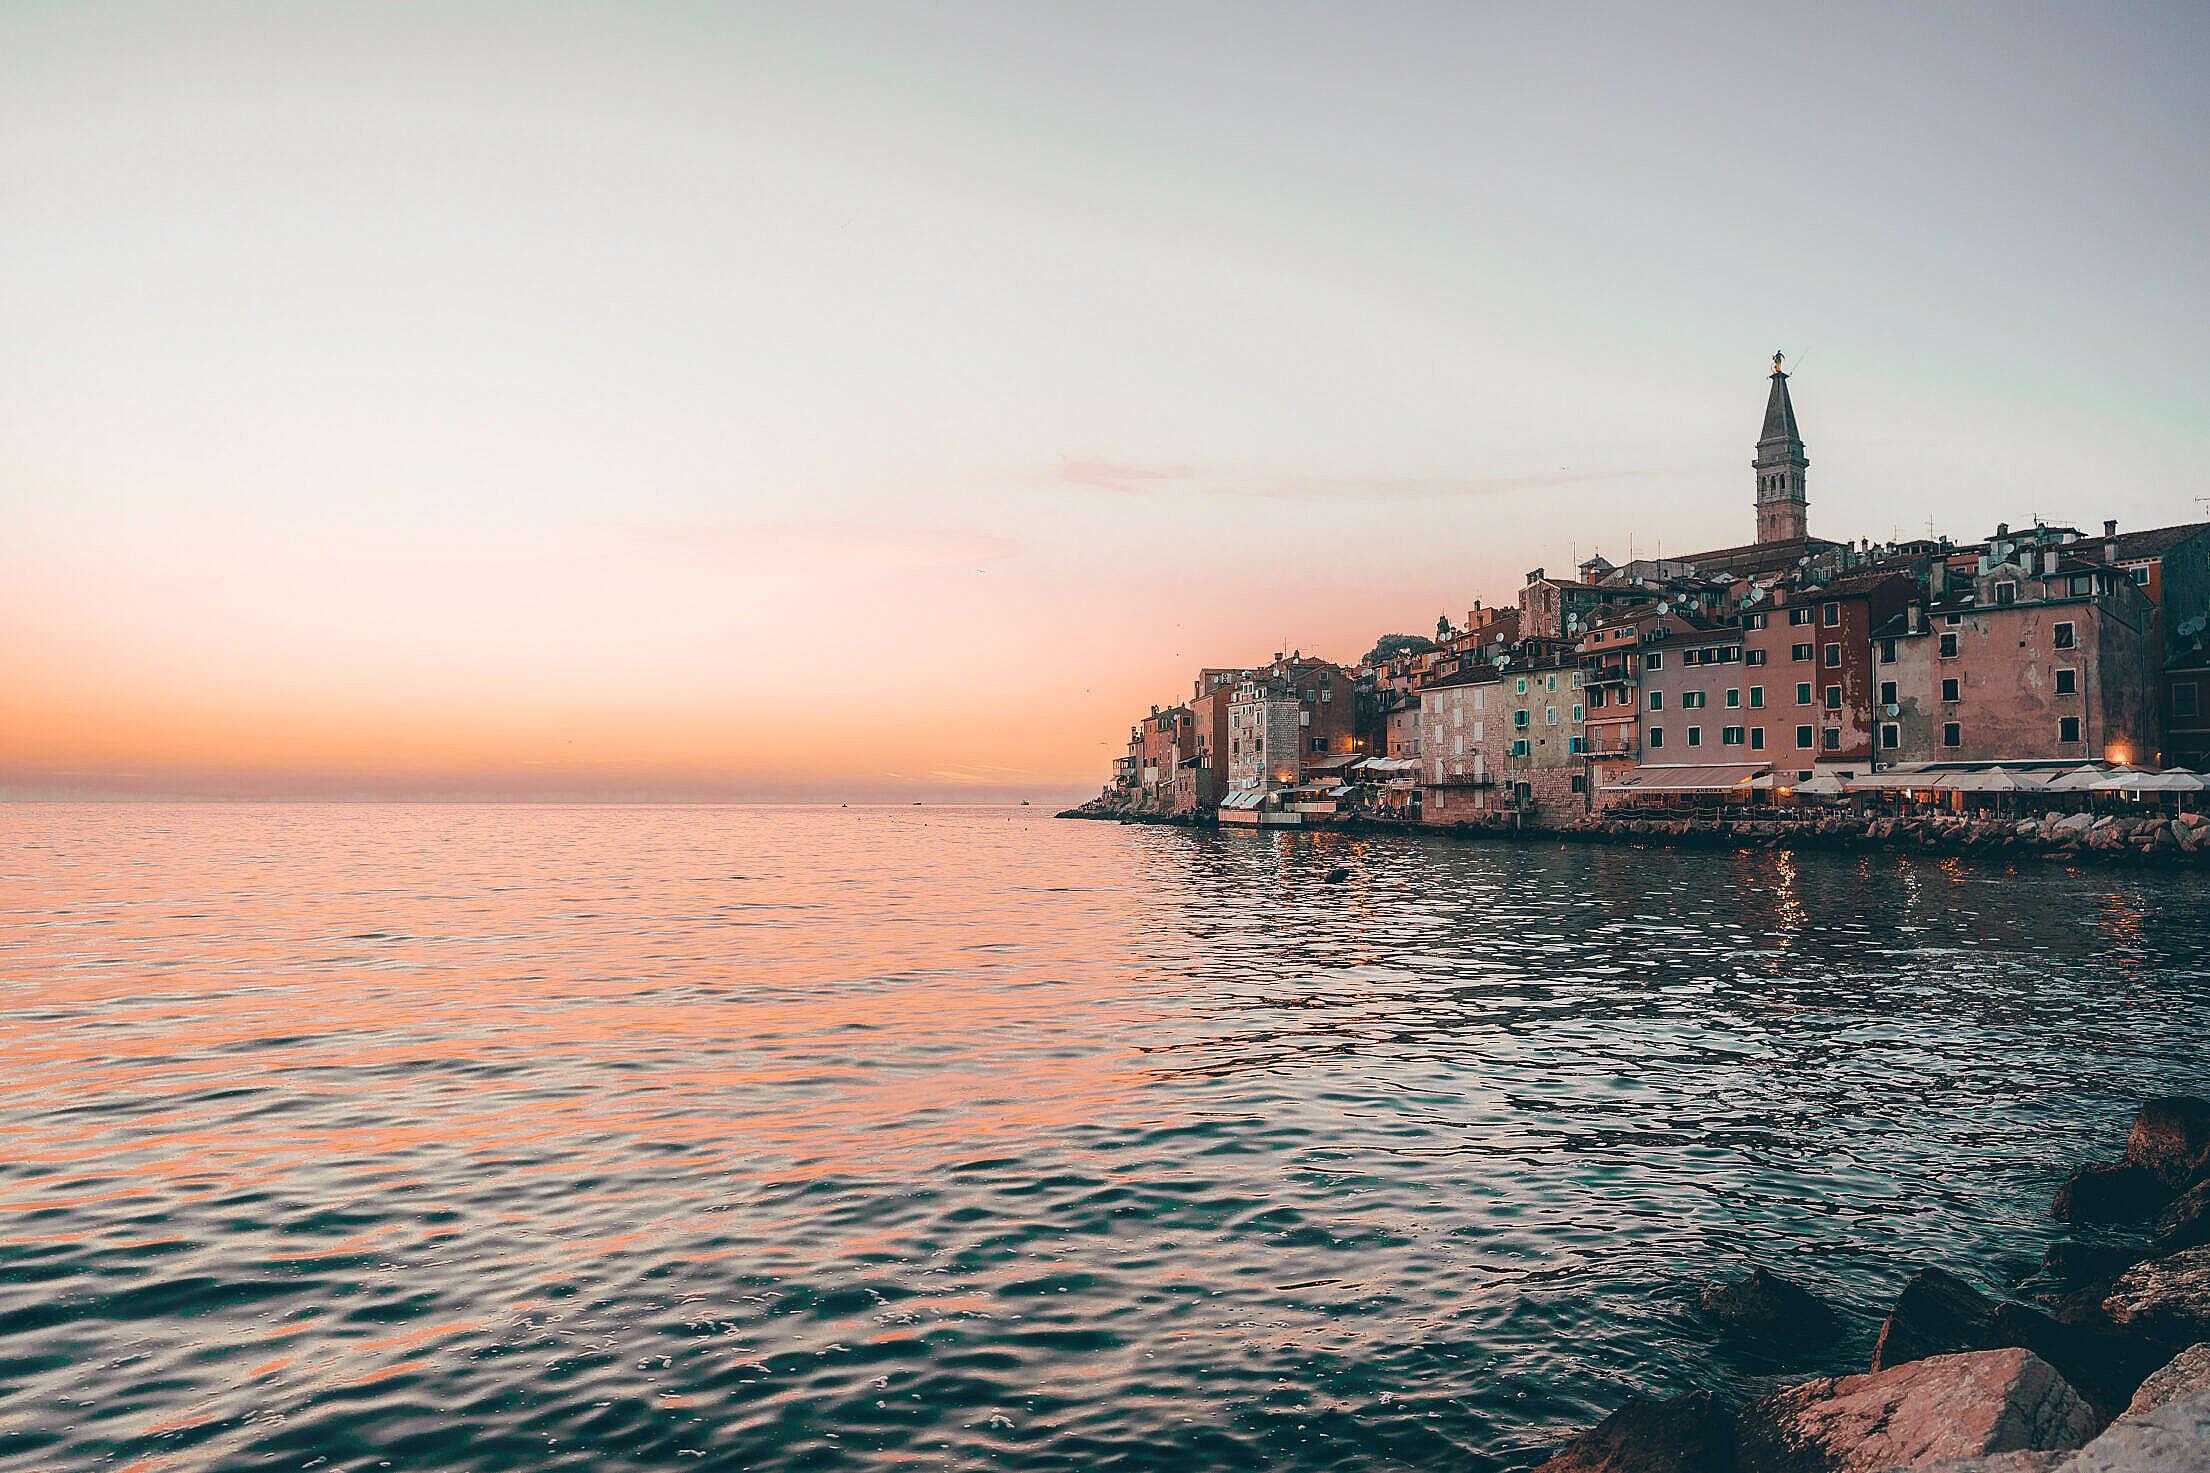 Sunset in Rovinj, Croatia Free Stock Photo